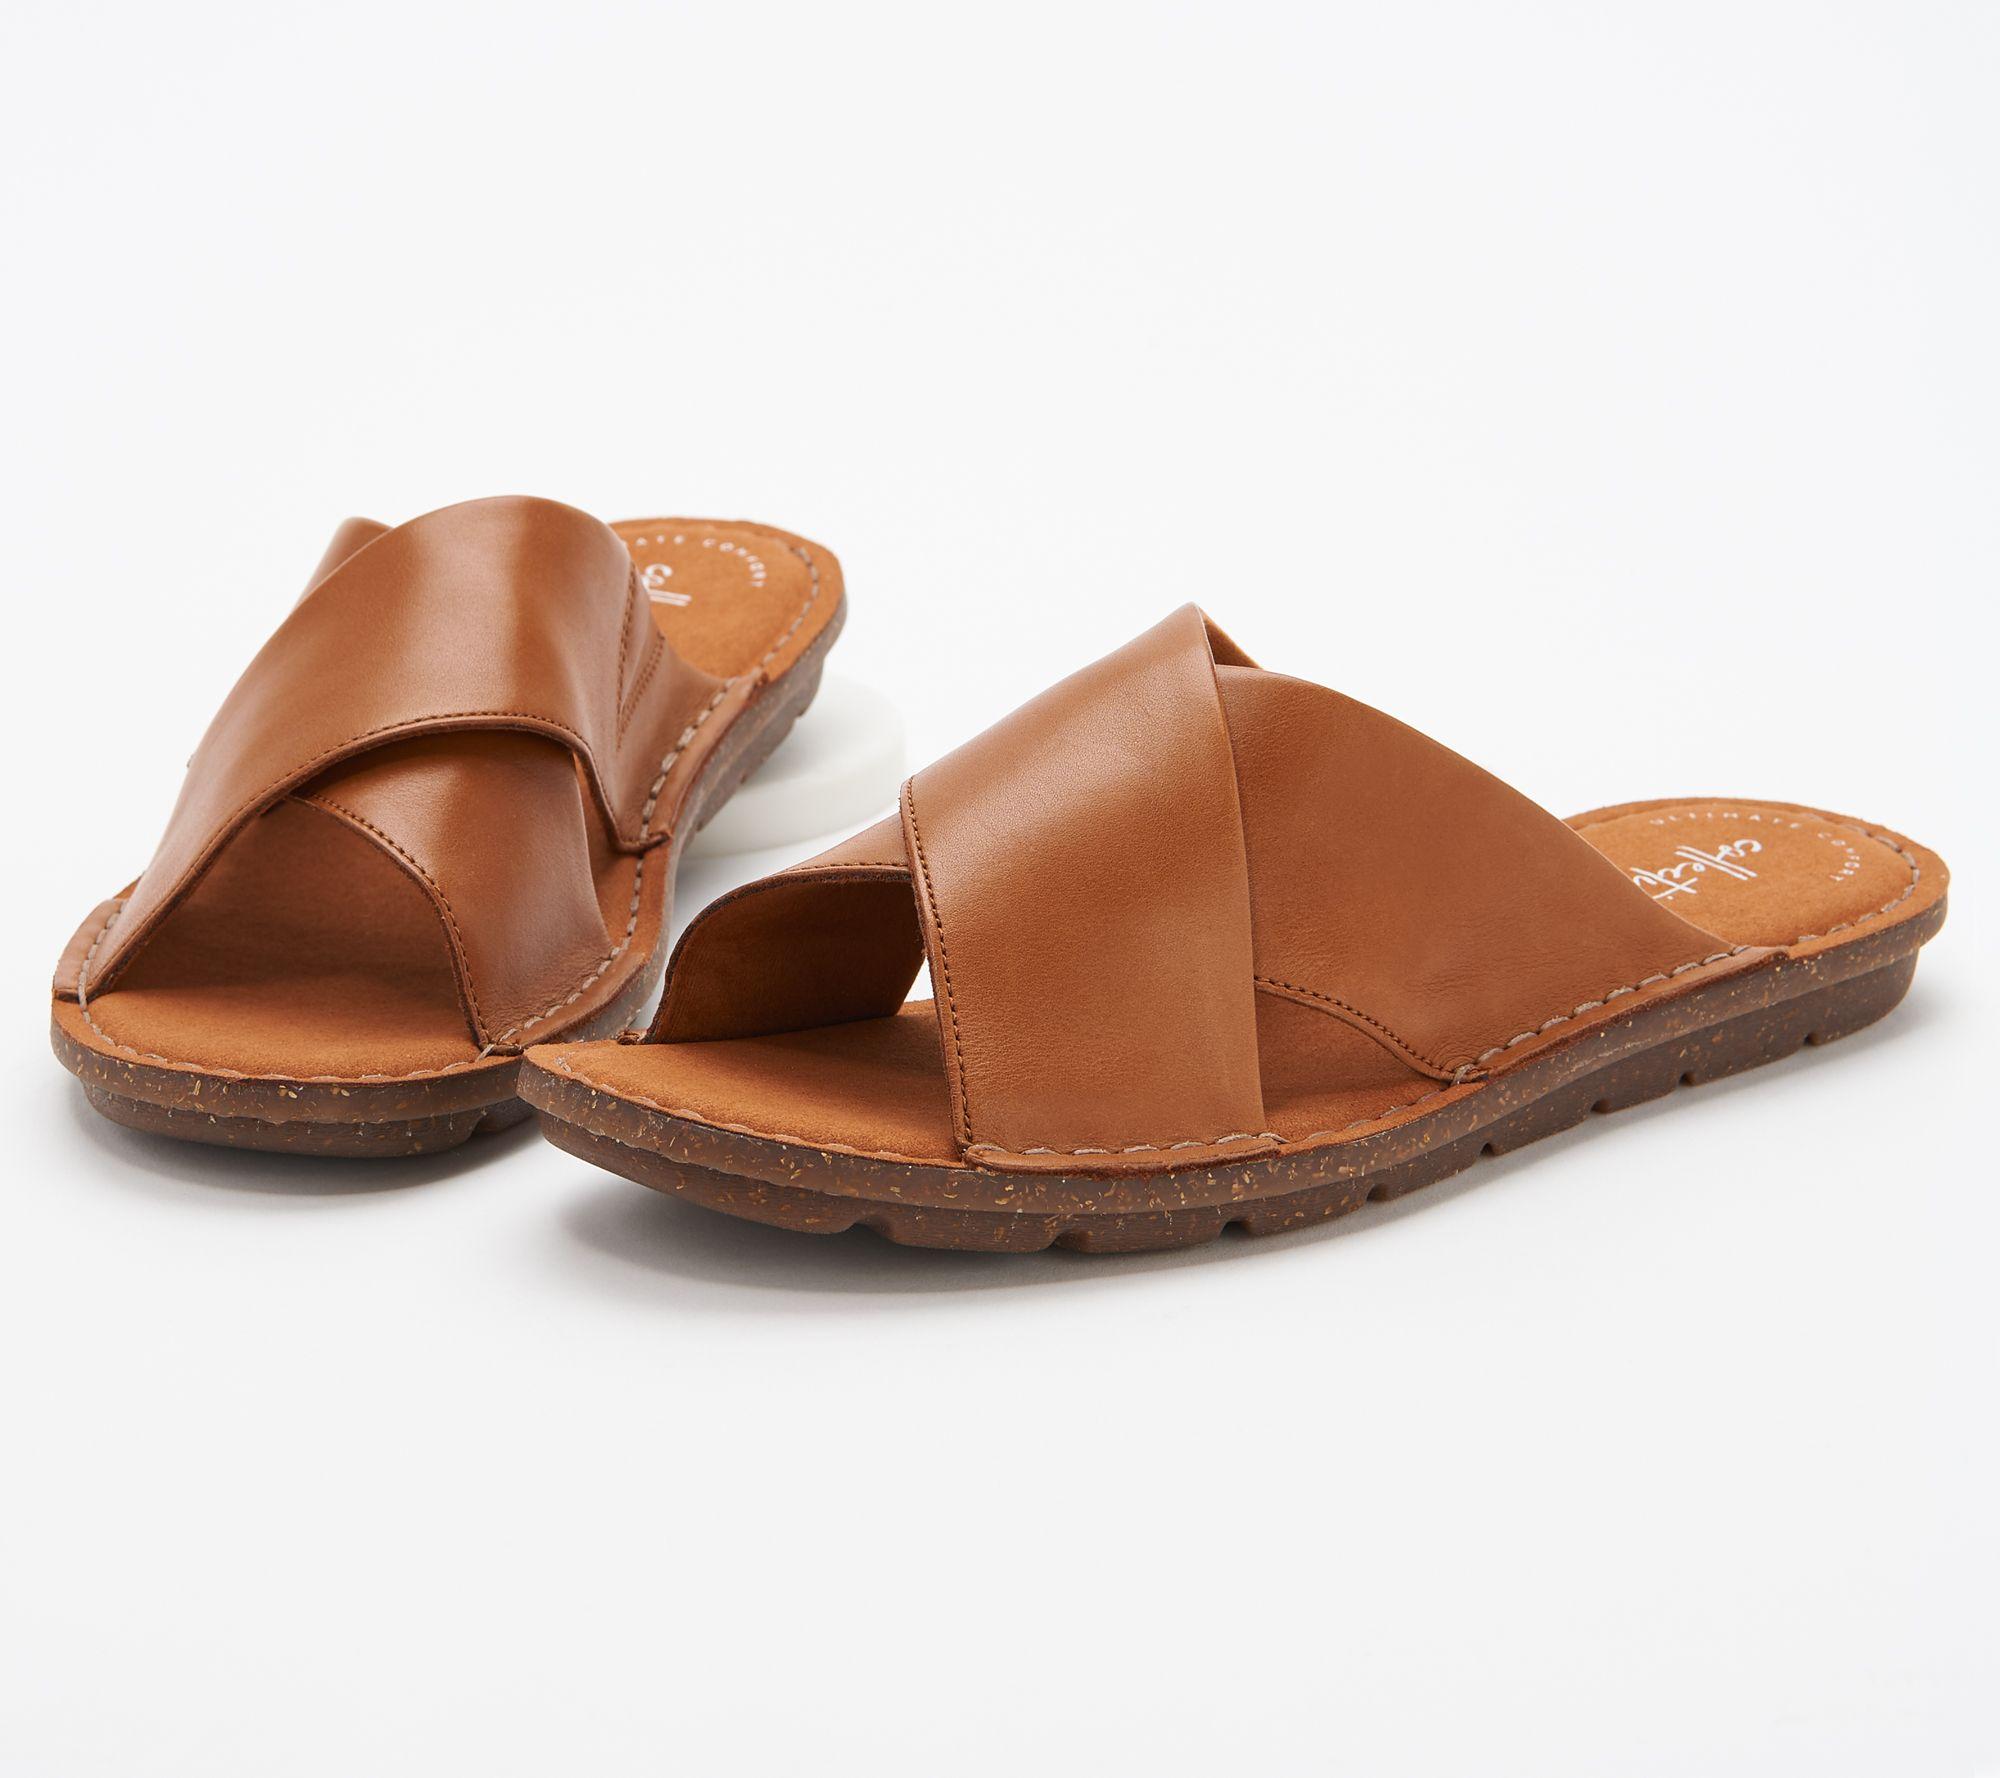 Clarks studio beat flat sandals